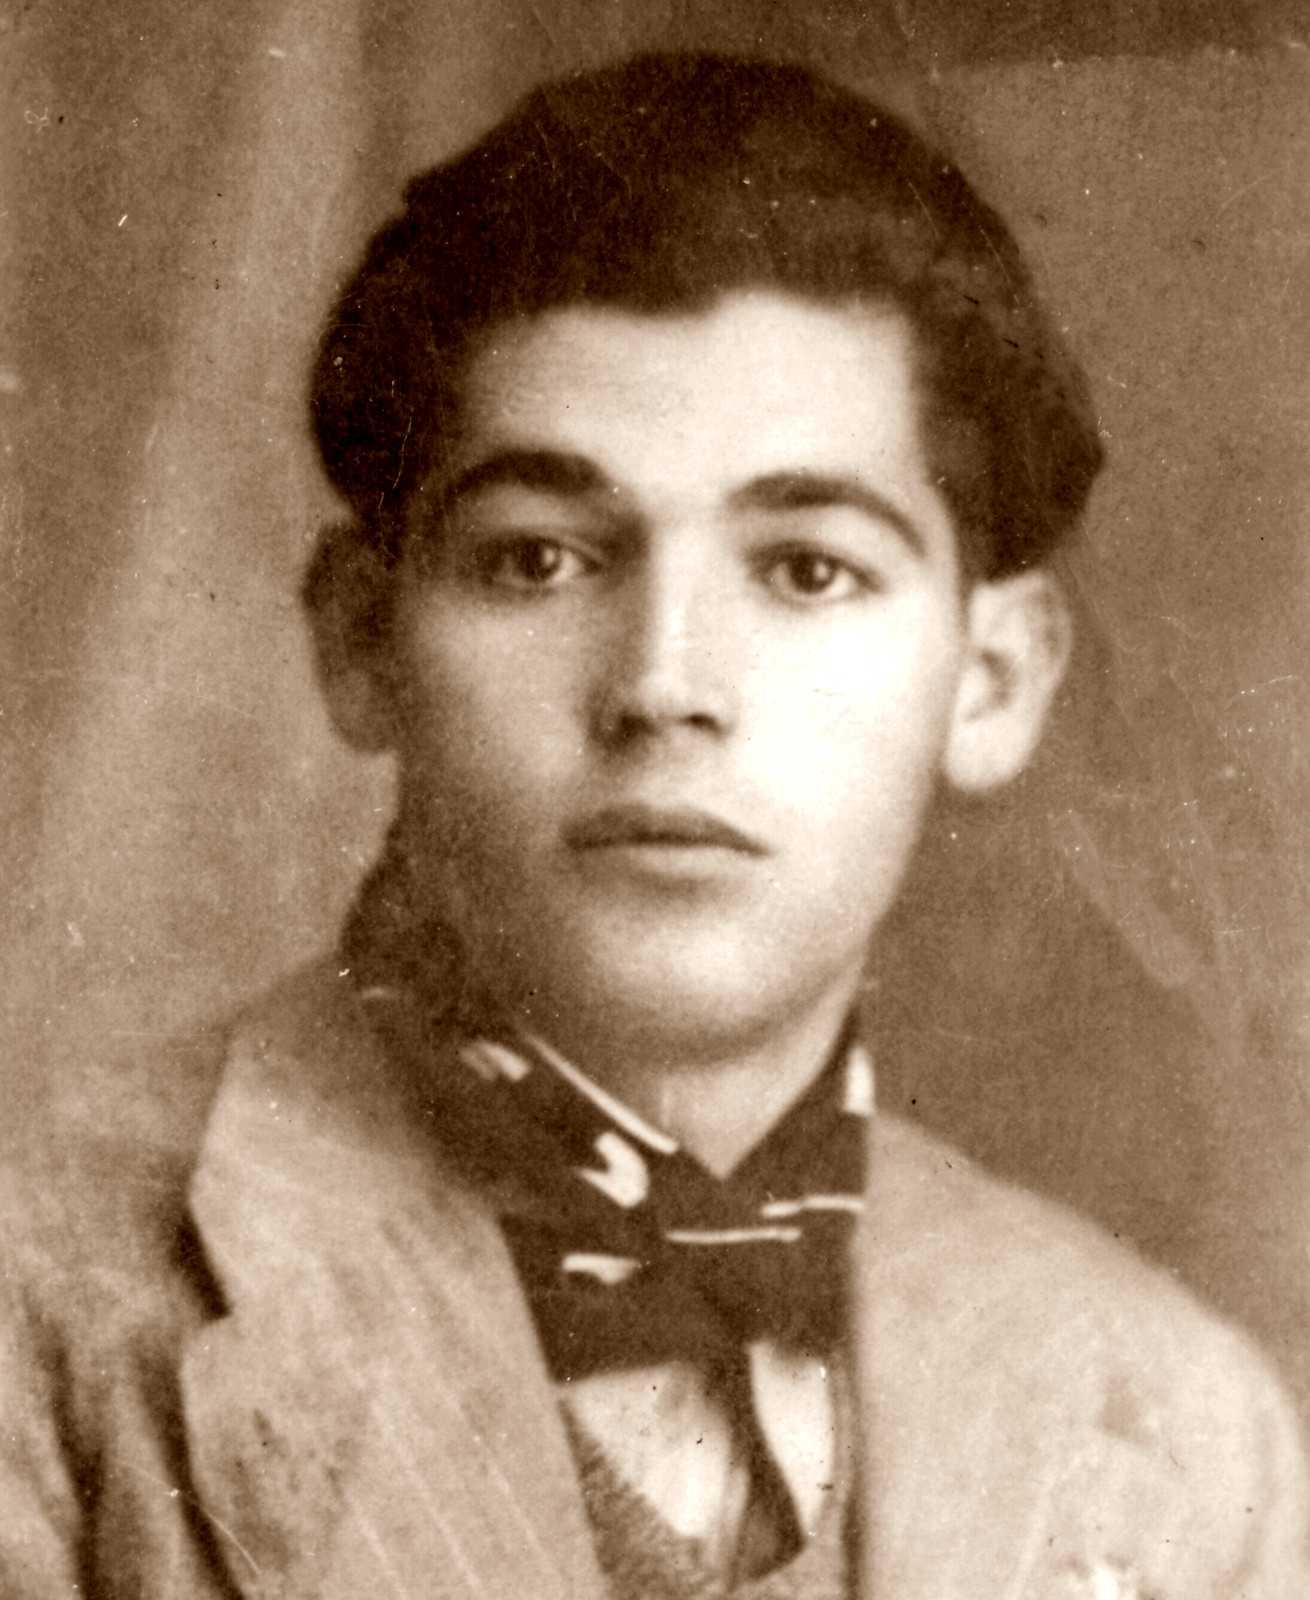 Antonio García Álvarez (1935)